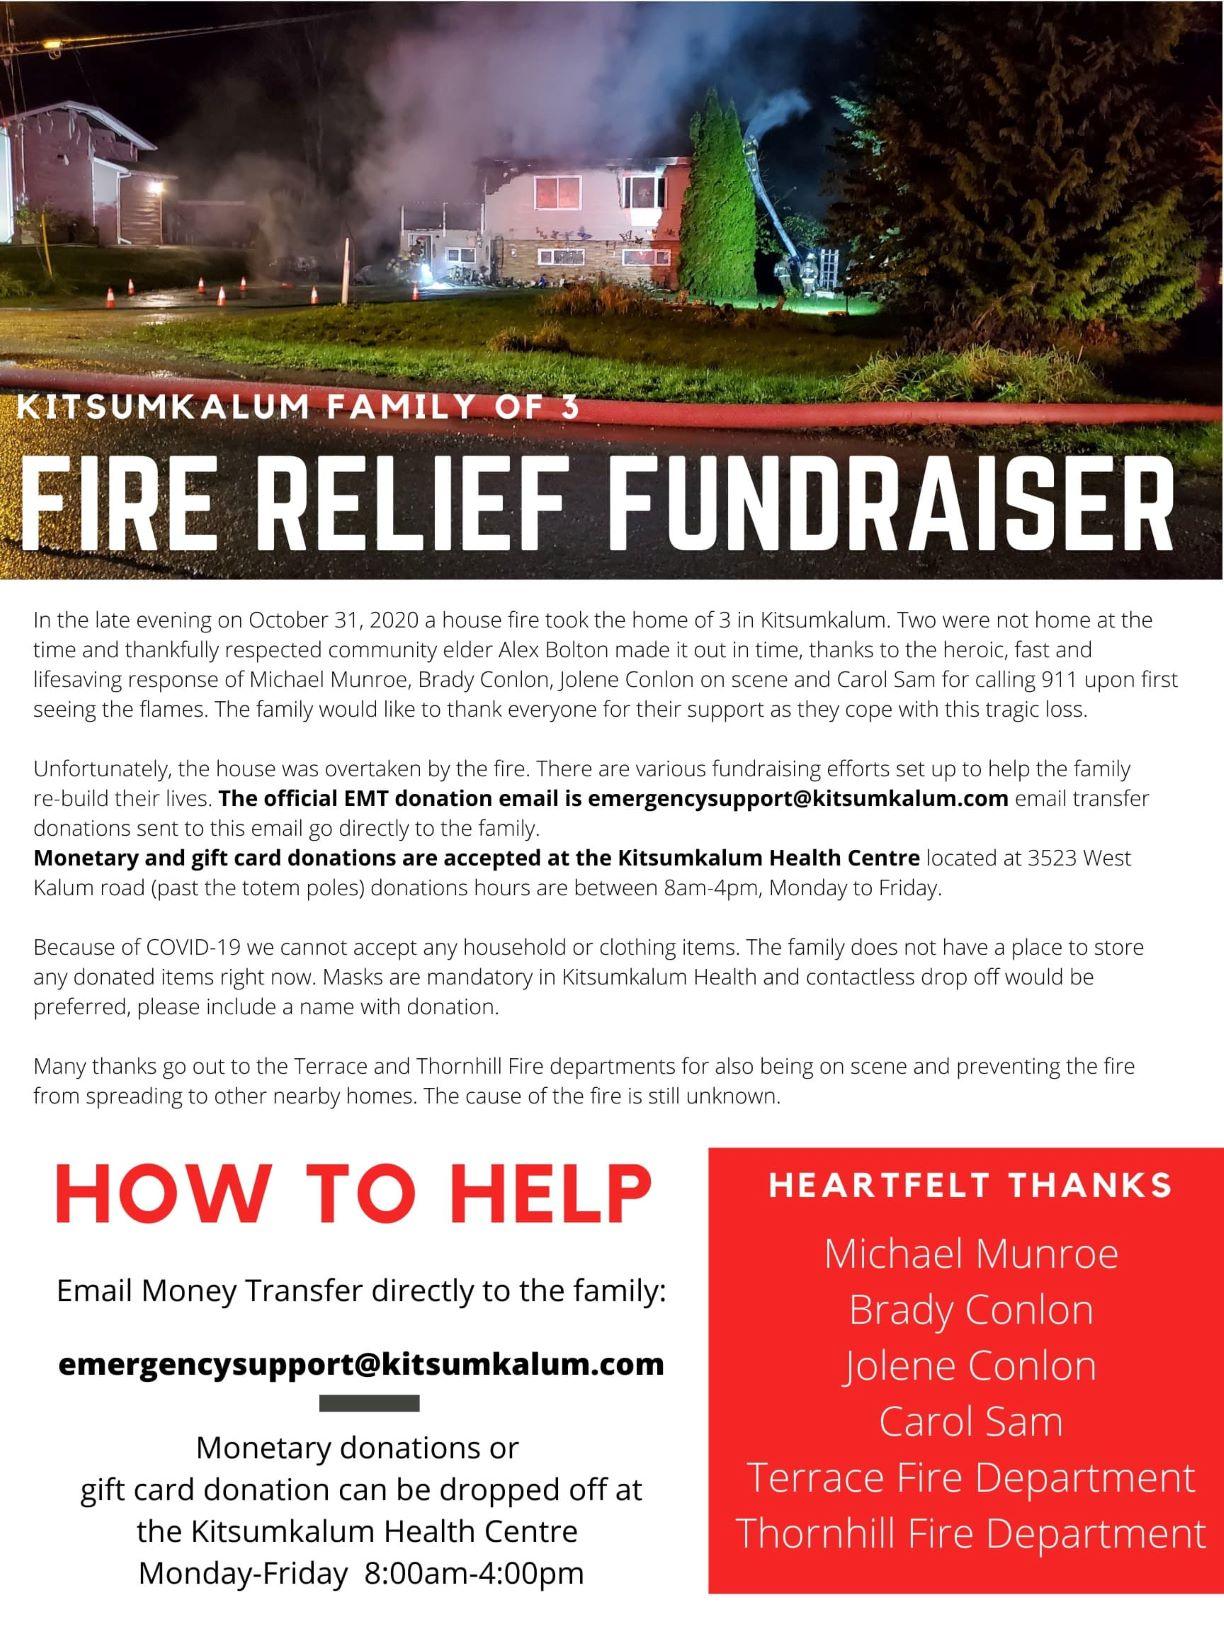 Fire Relief Fundraiser